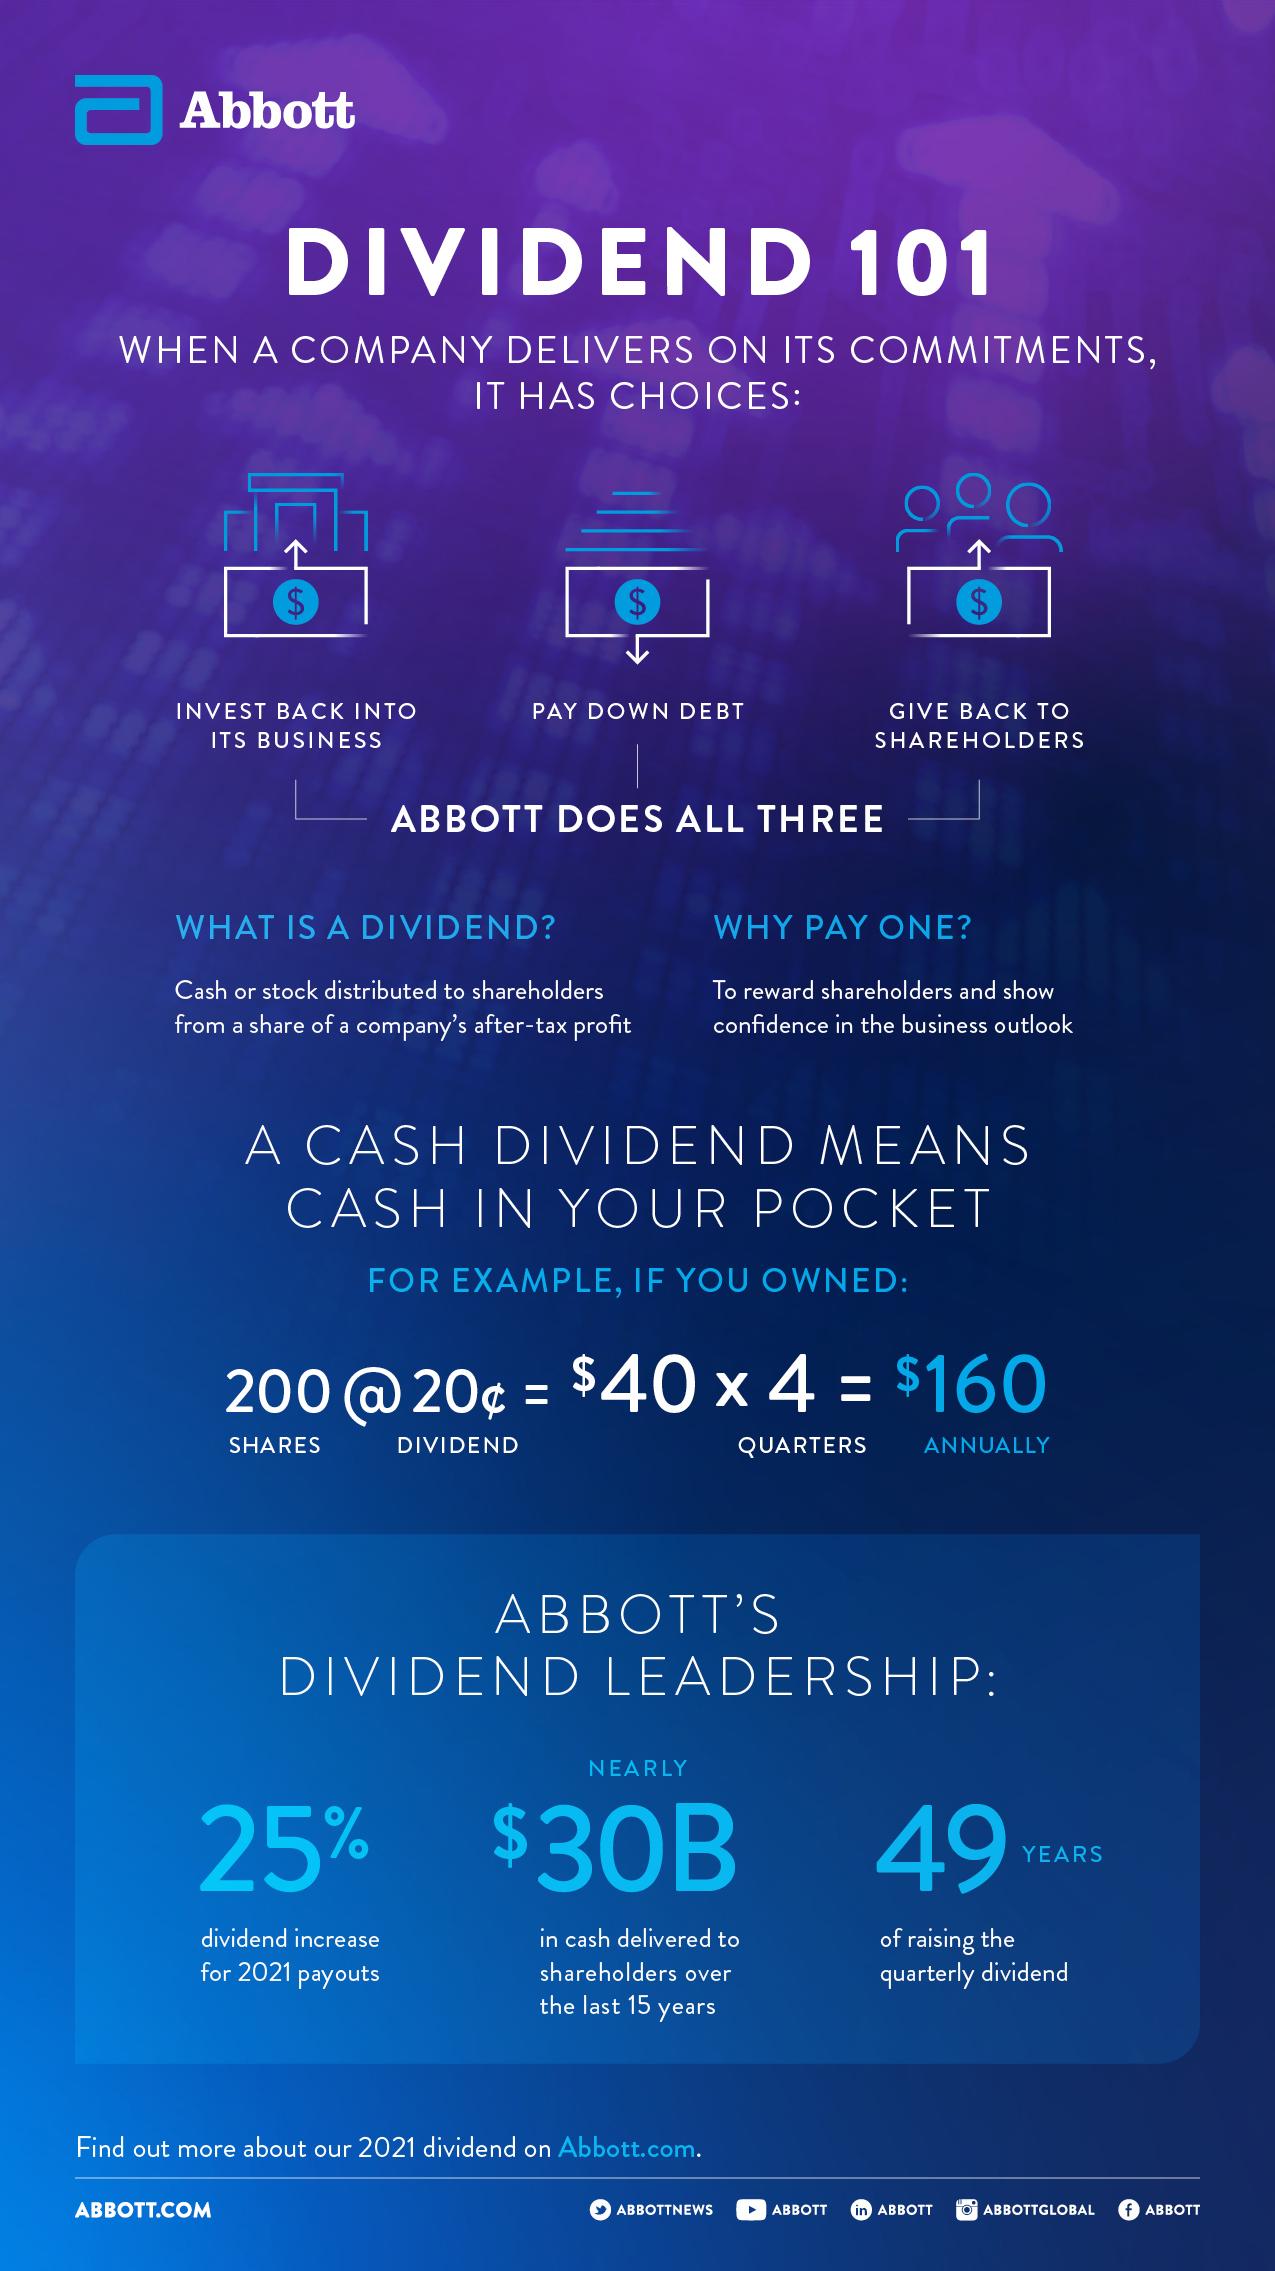 Q4 2020 Dividends